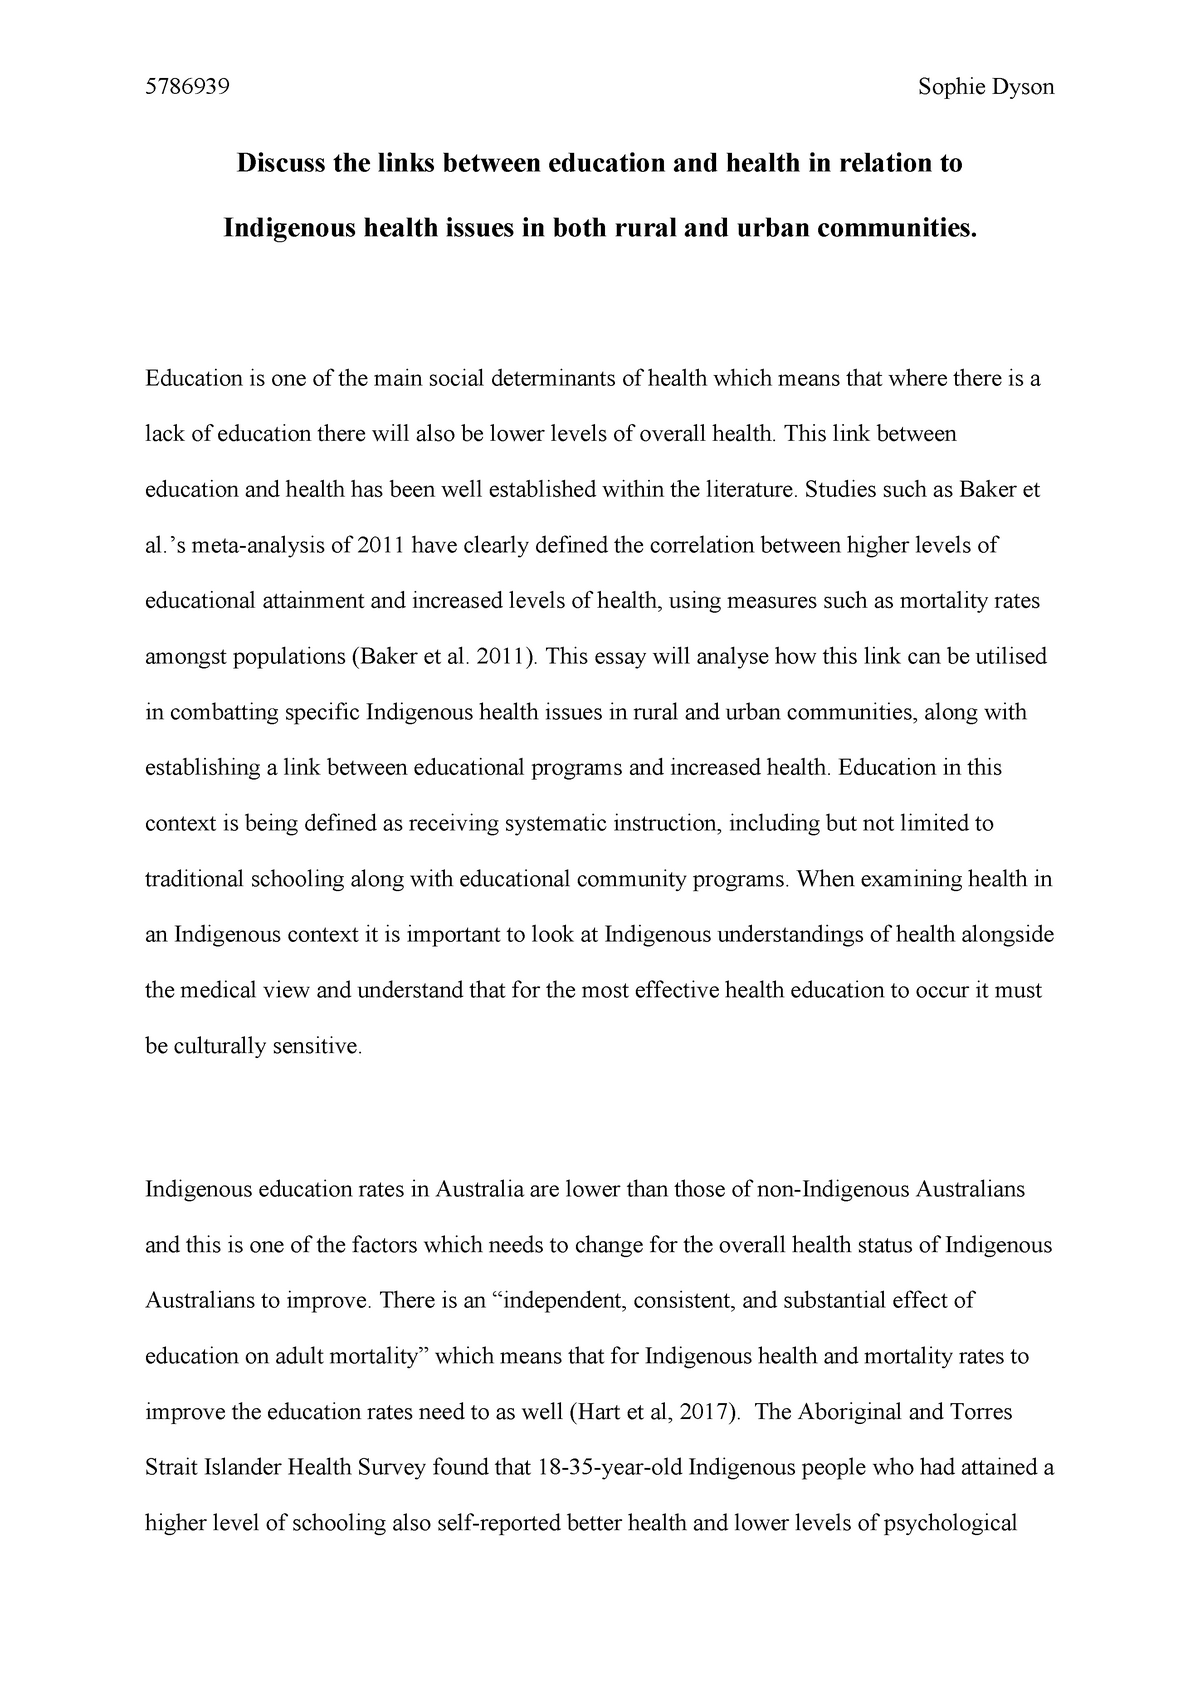 major essay on education and health   nmih comparative  major essay on education and health   nmih comparative indigenous health  issues   studocu